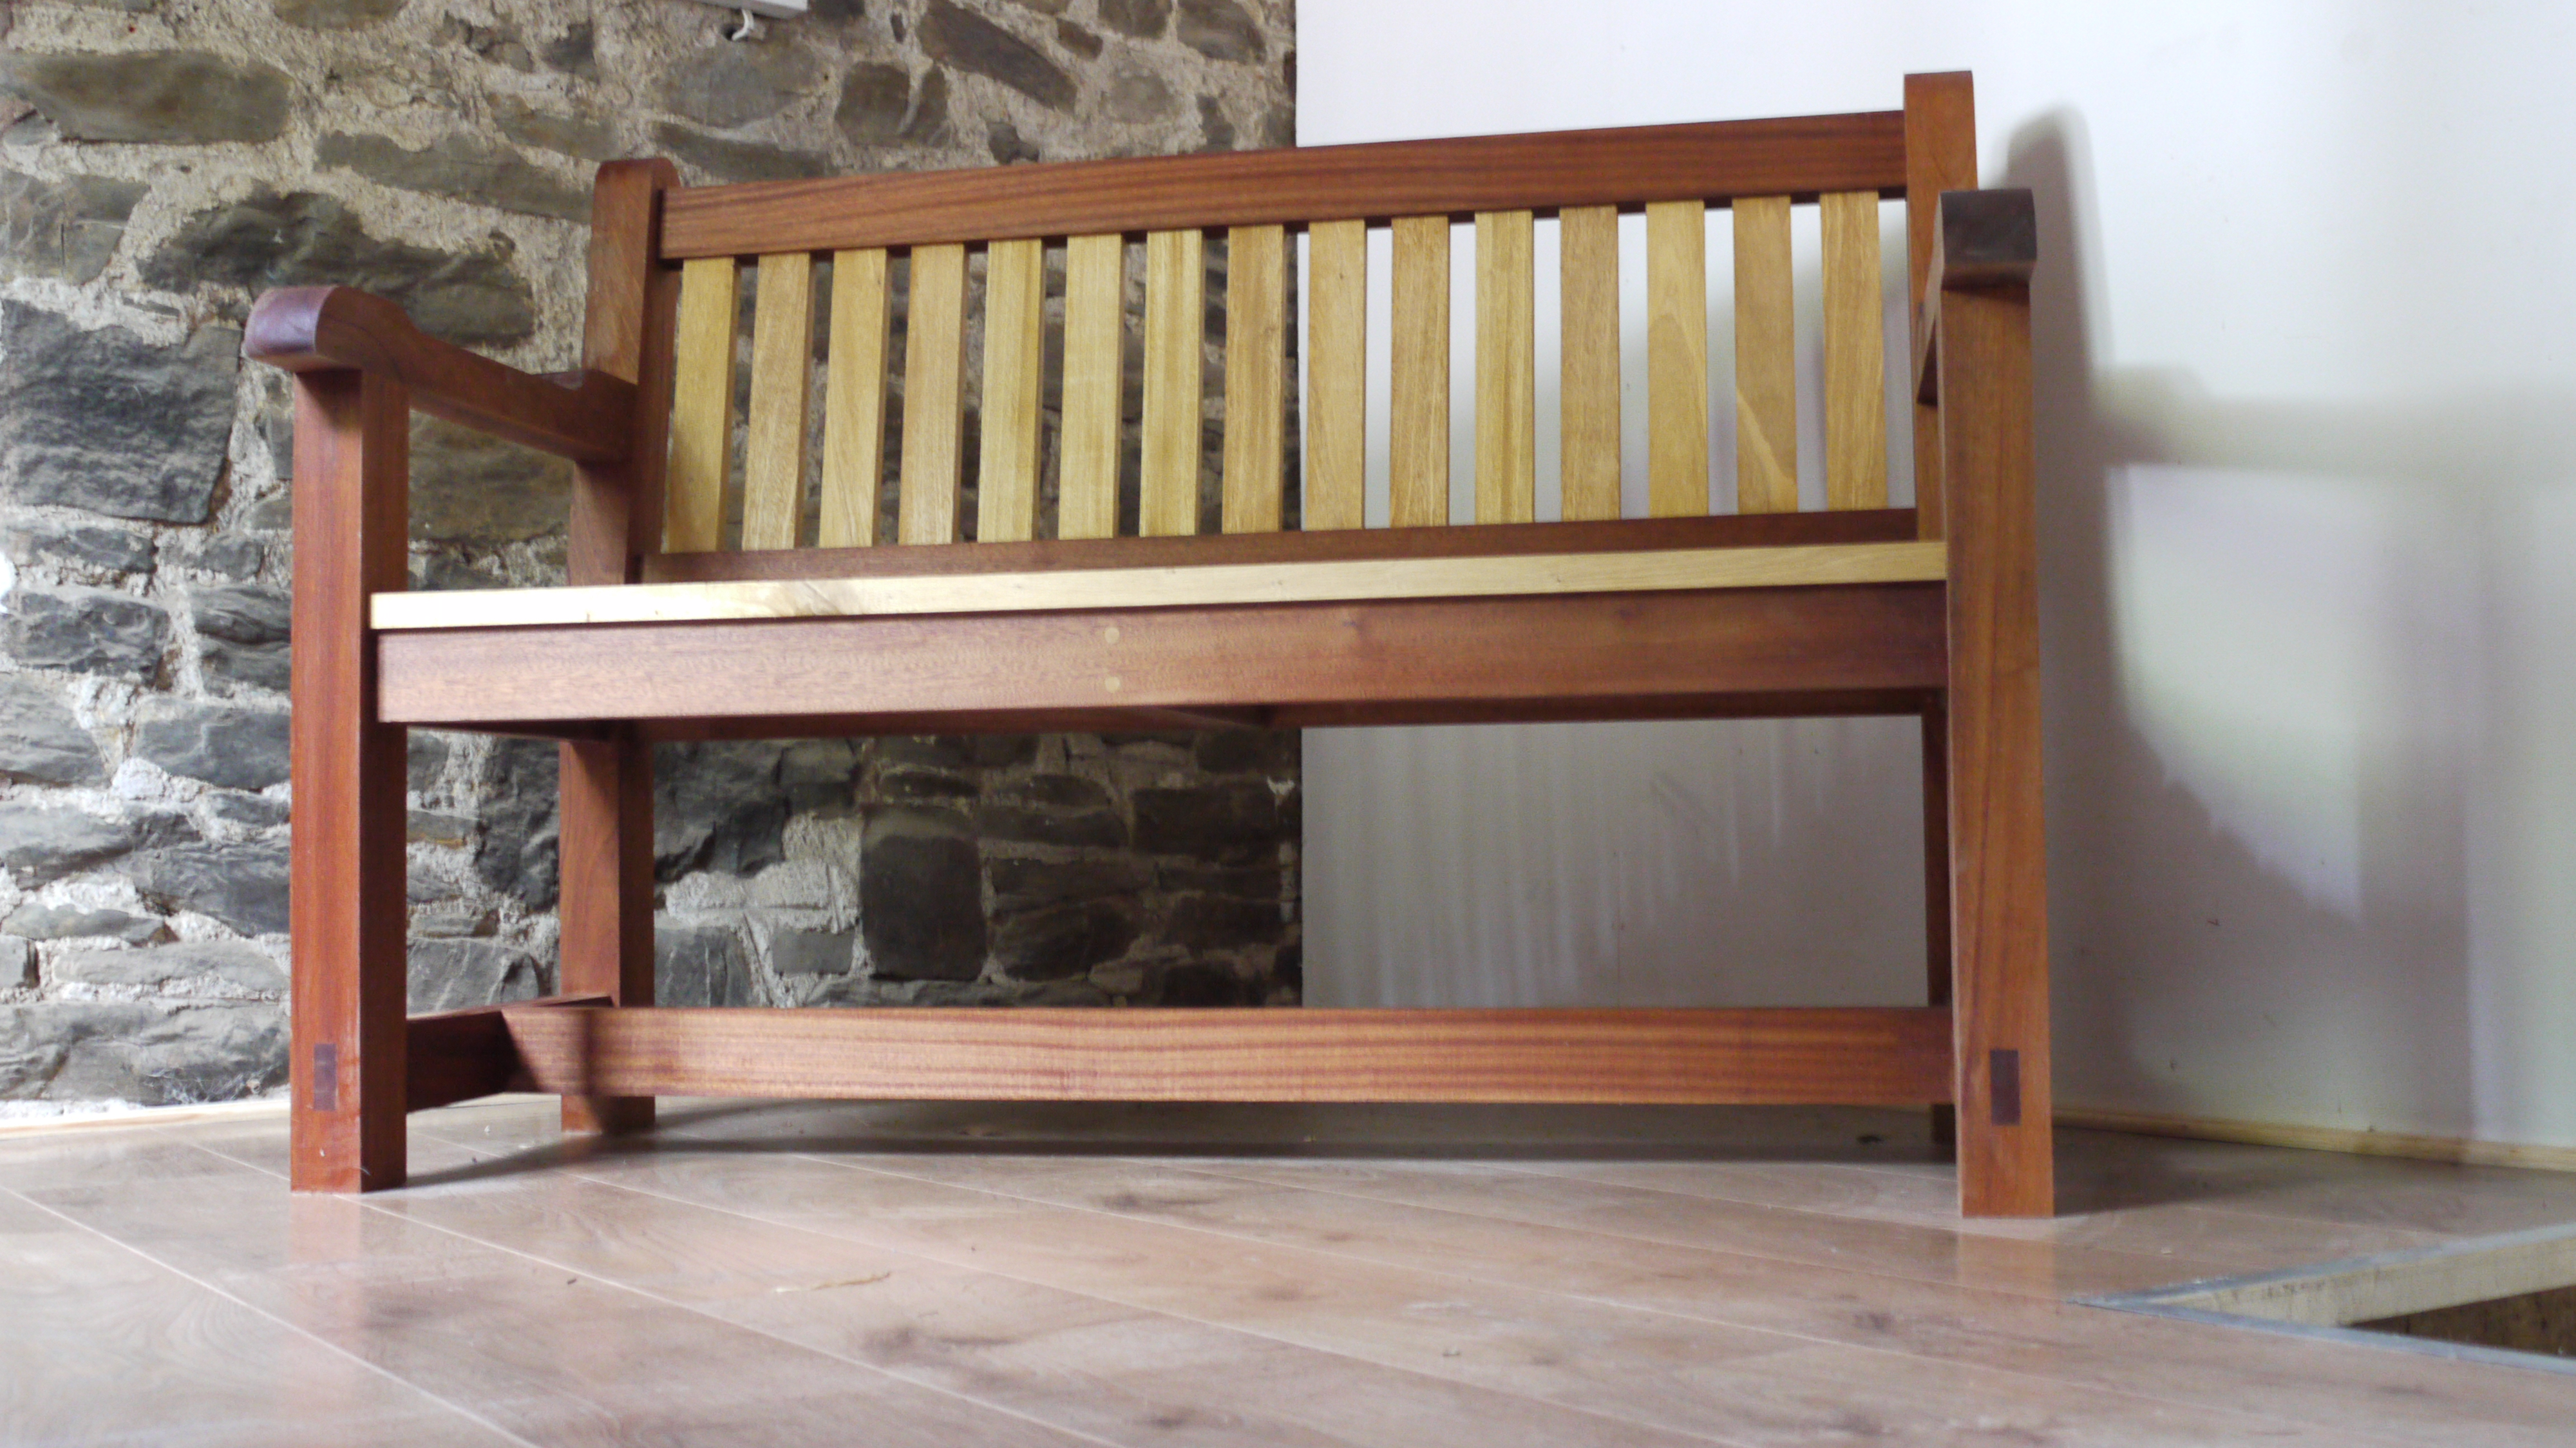 Dual Colour Bench, The Wooden Workshop, Oakford, Devon (18)